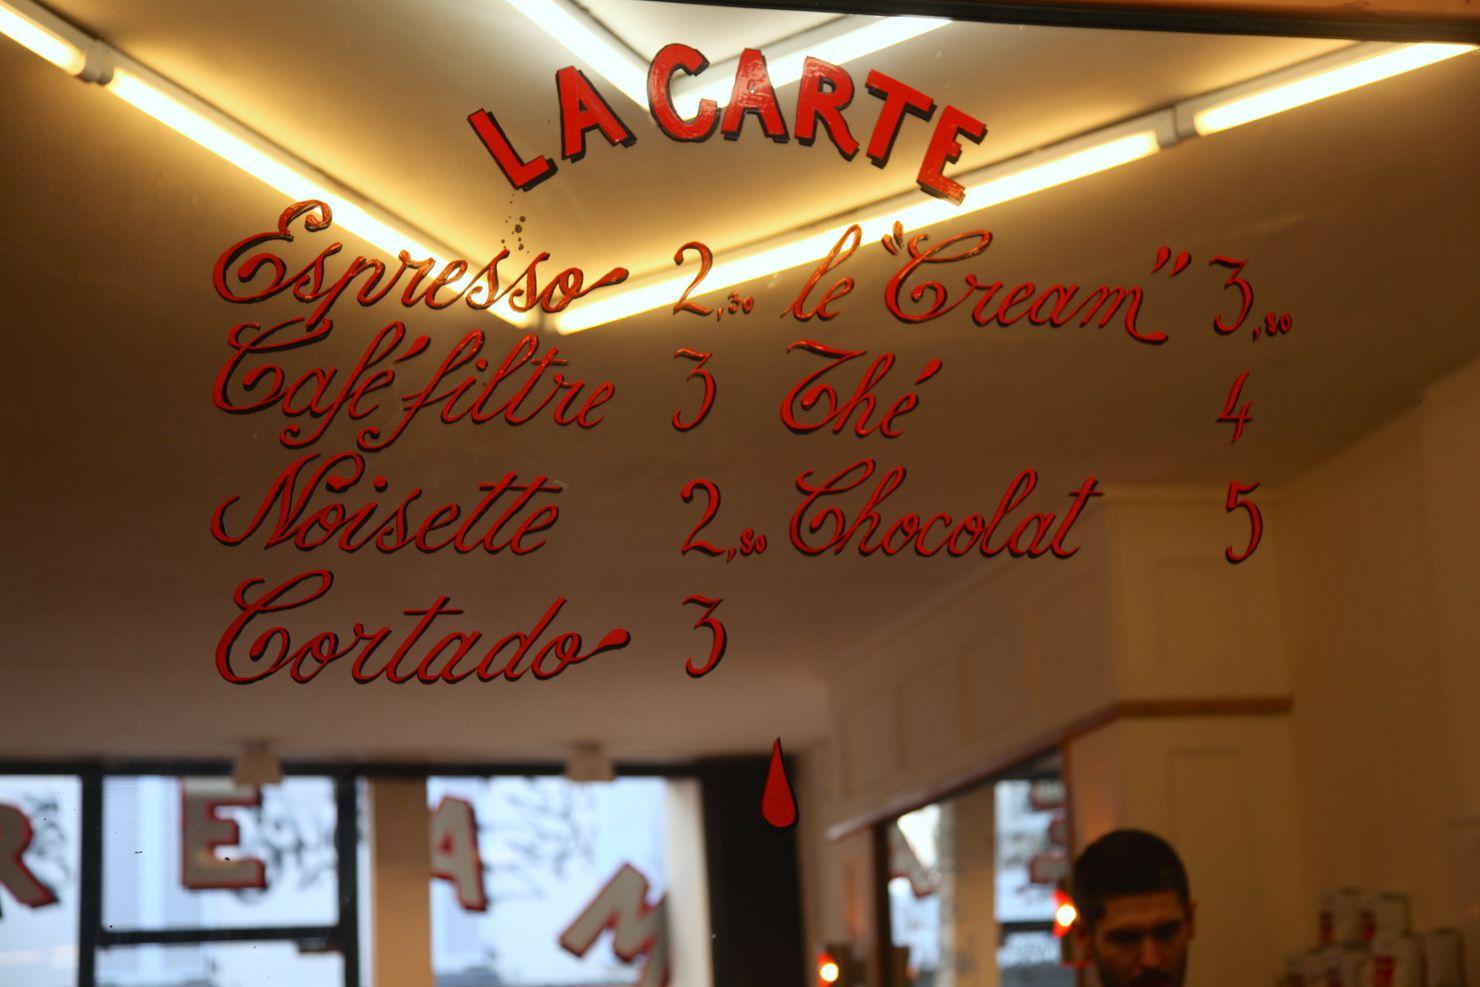 CREAM Joins New Crop Of Paris Cafes